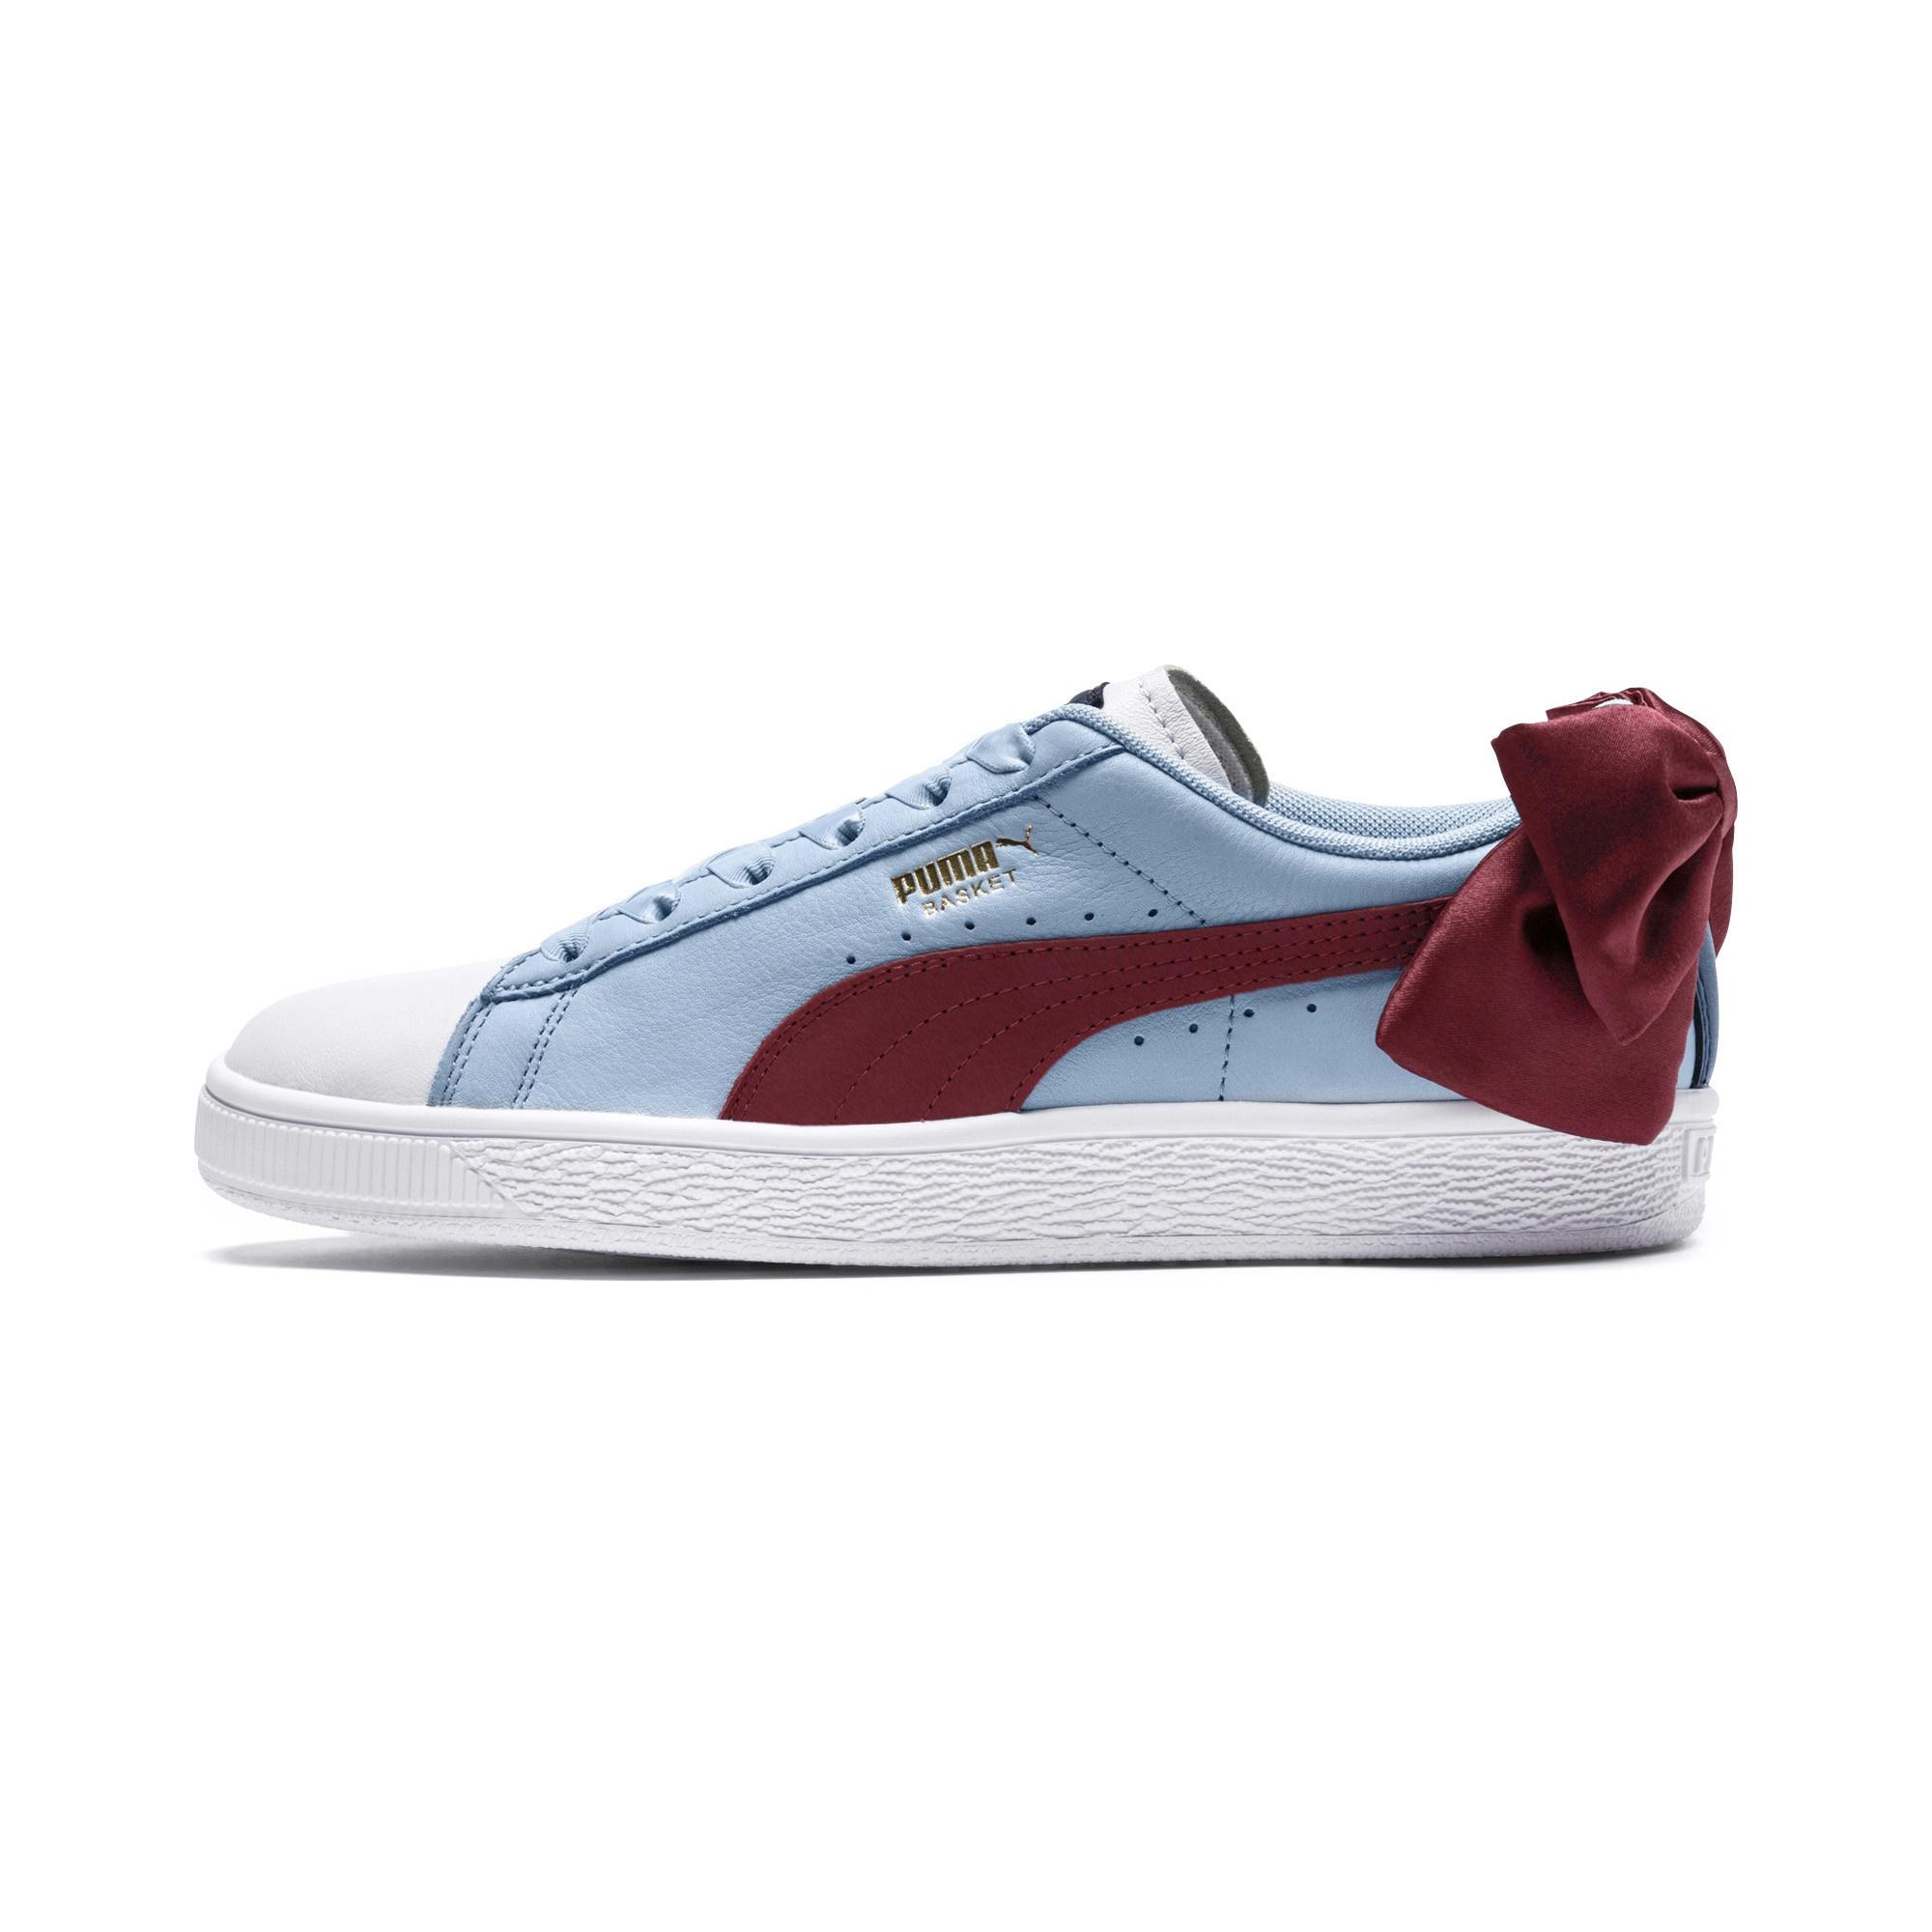 Puma sneakers Basket Bowladies light blue - TWM Tom ...